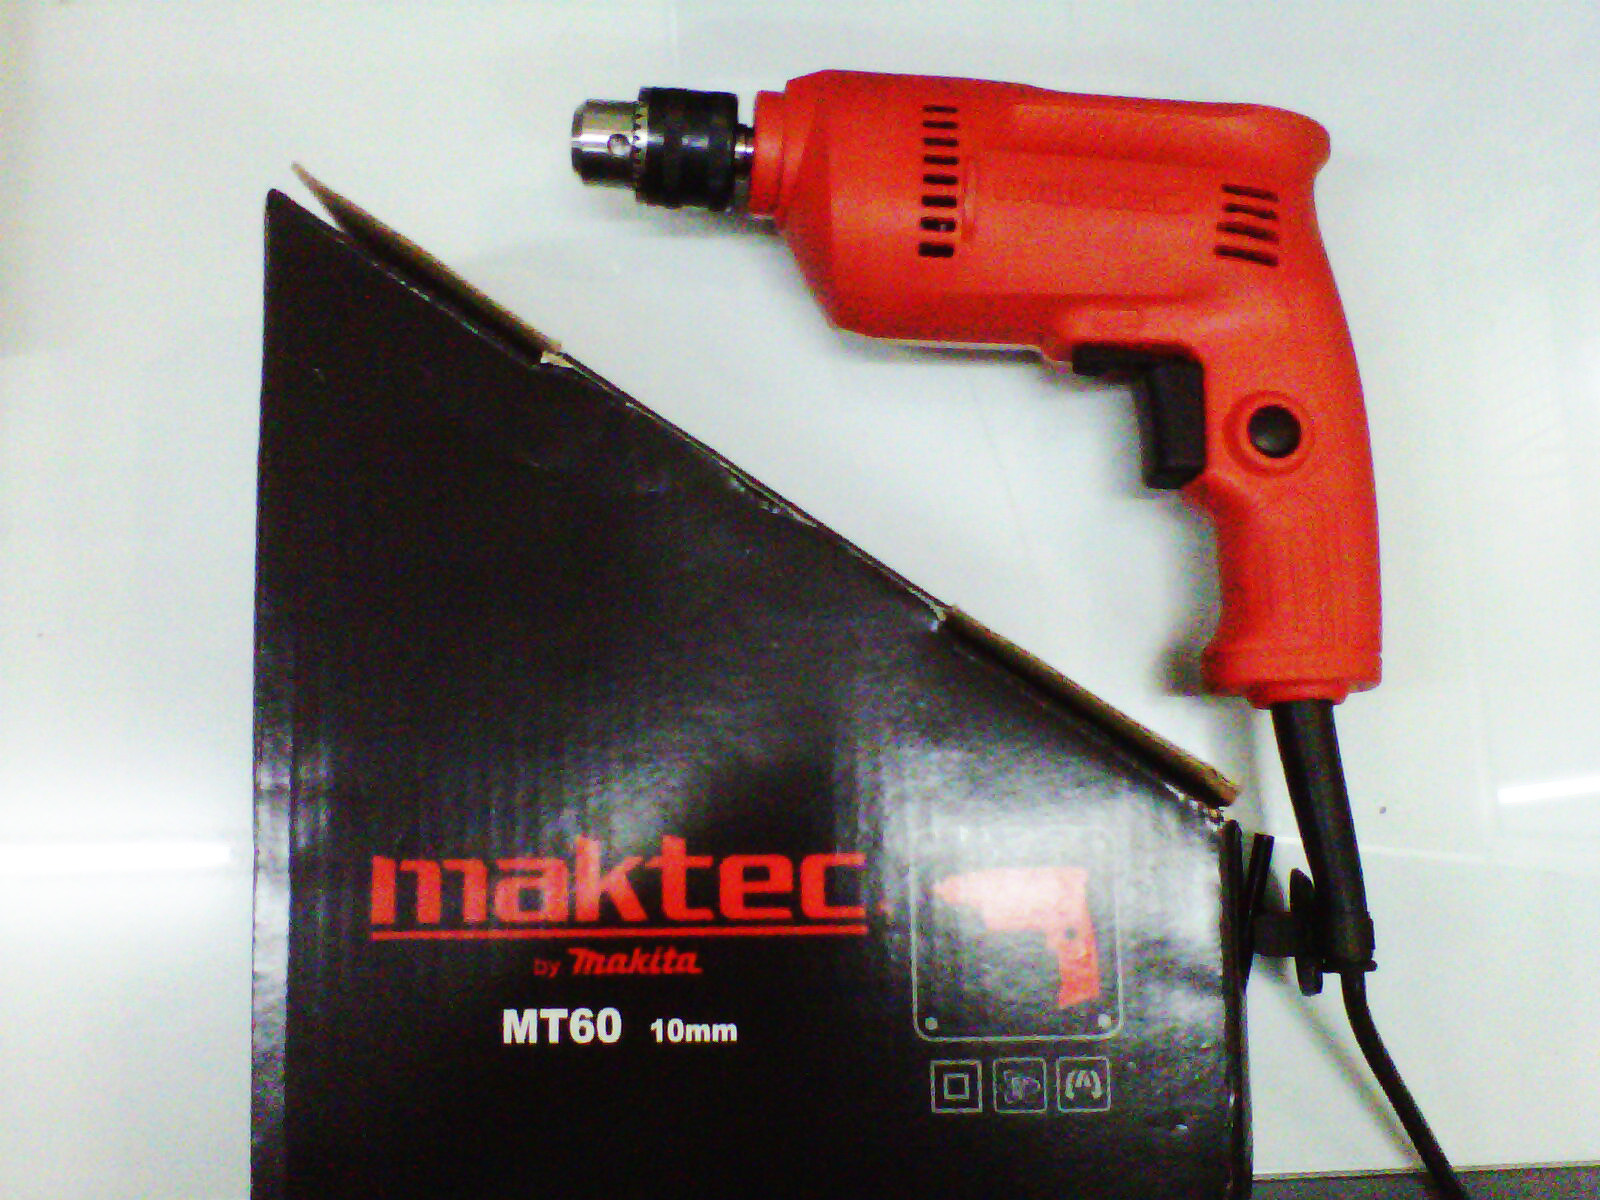 Makita Maktec Mt60 Mesin Bor Listrik 10mm Hand Pipe Bender Krisbow 3 8 7 8in Kw1500520 Info Lainnya